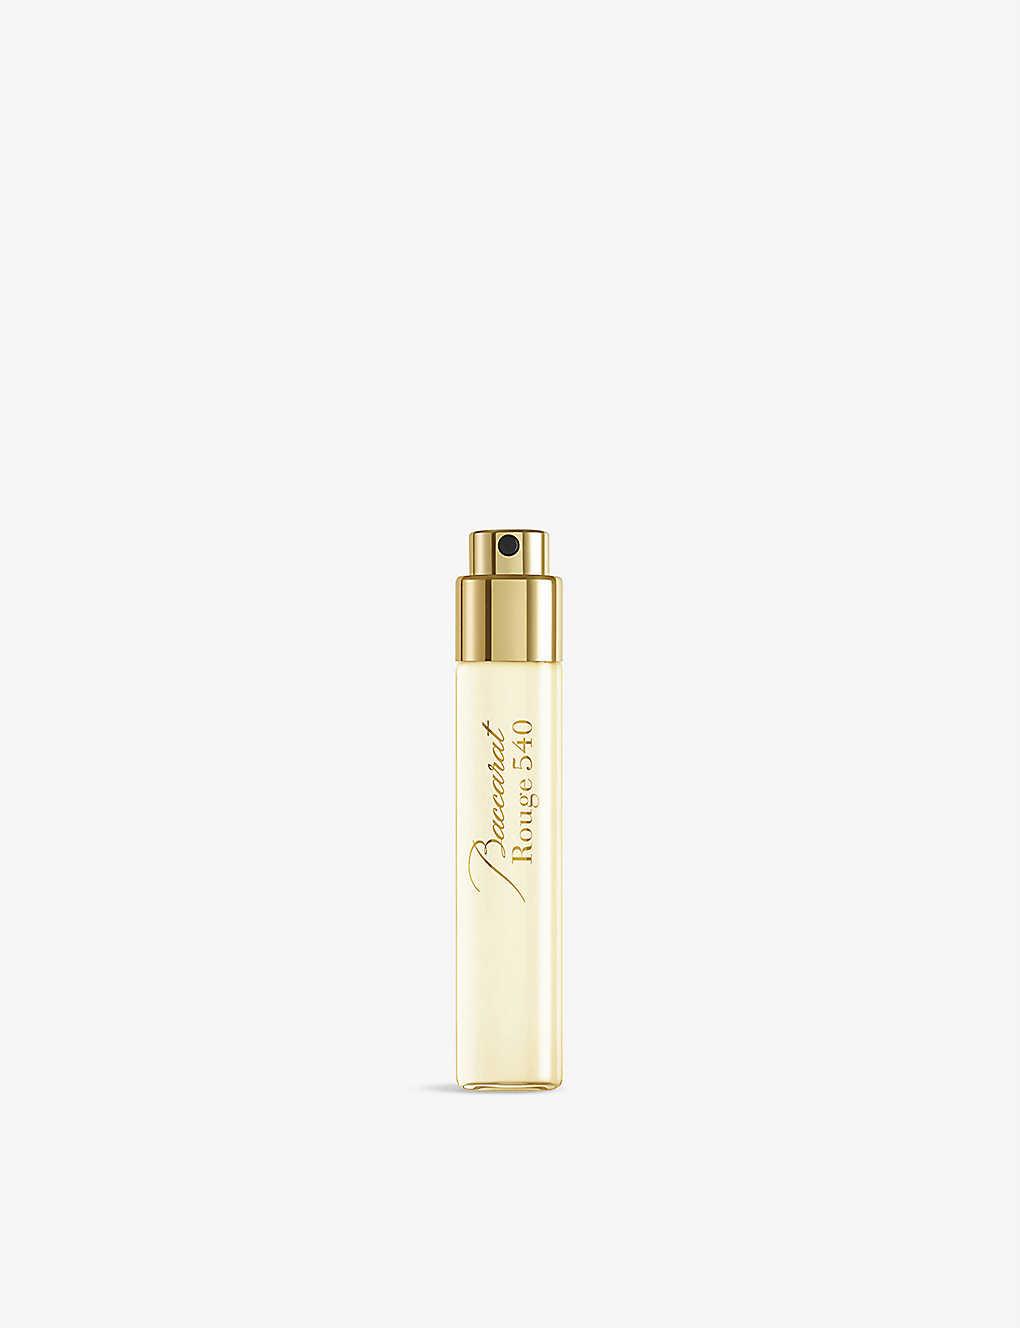 MAISON FRANCIS KURKDJIAN   Baccarat Rouge 20 eau de parfum travel ...